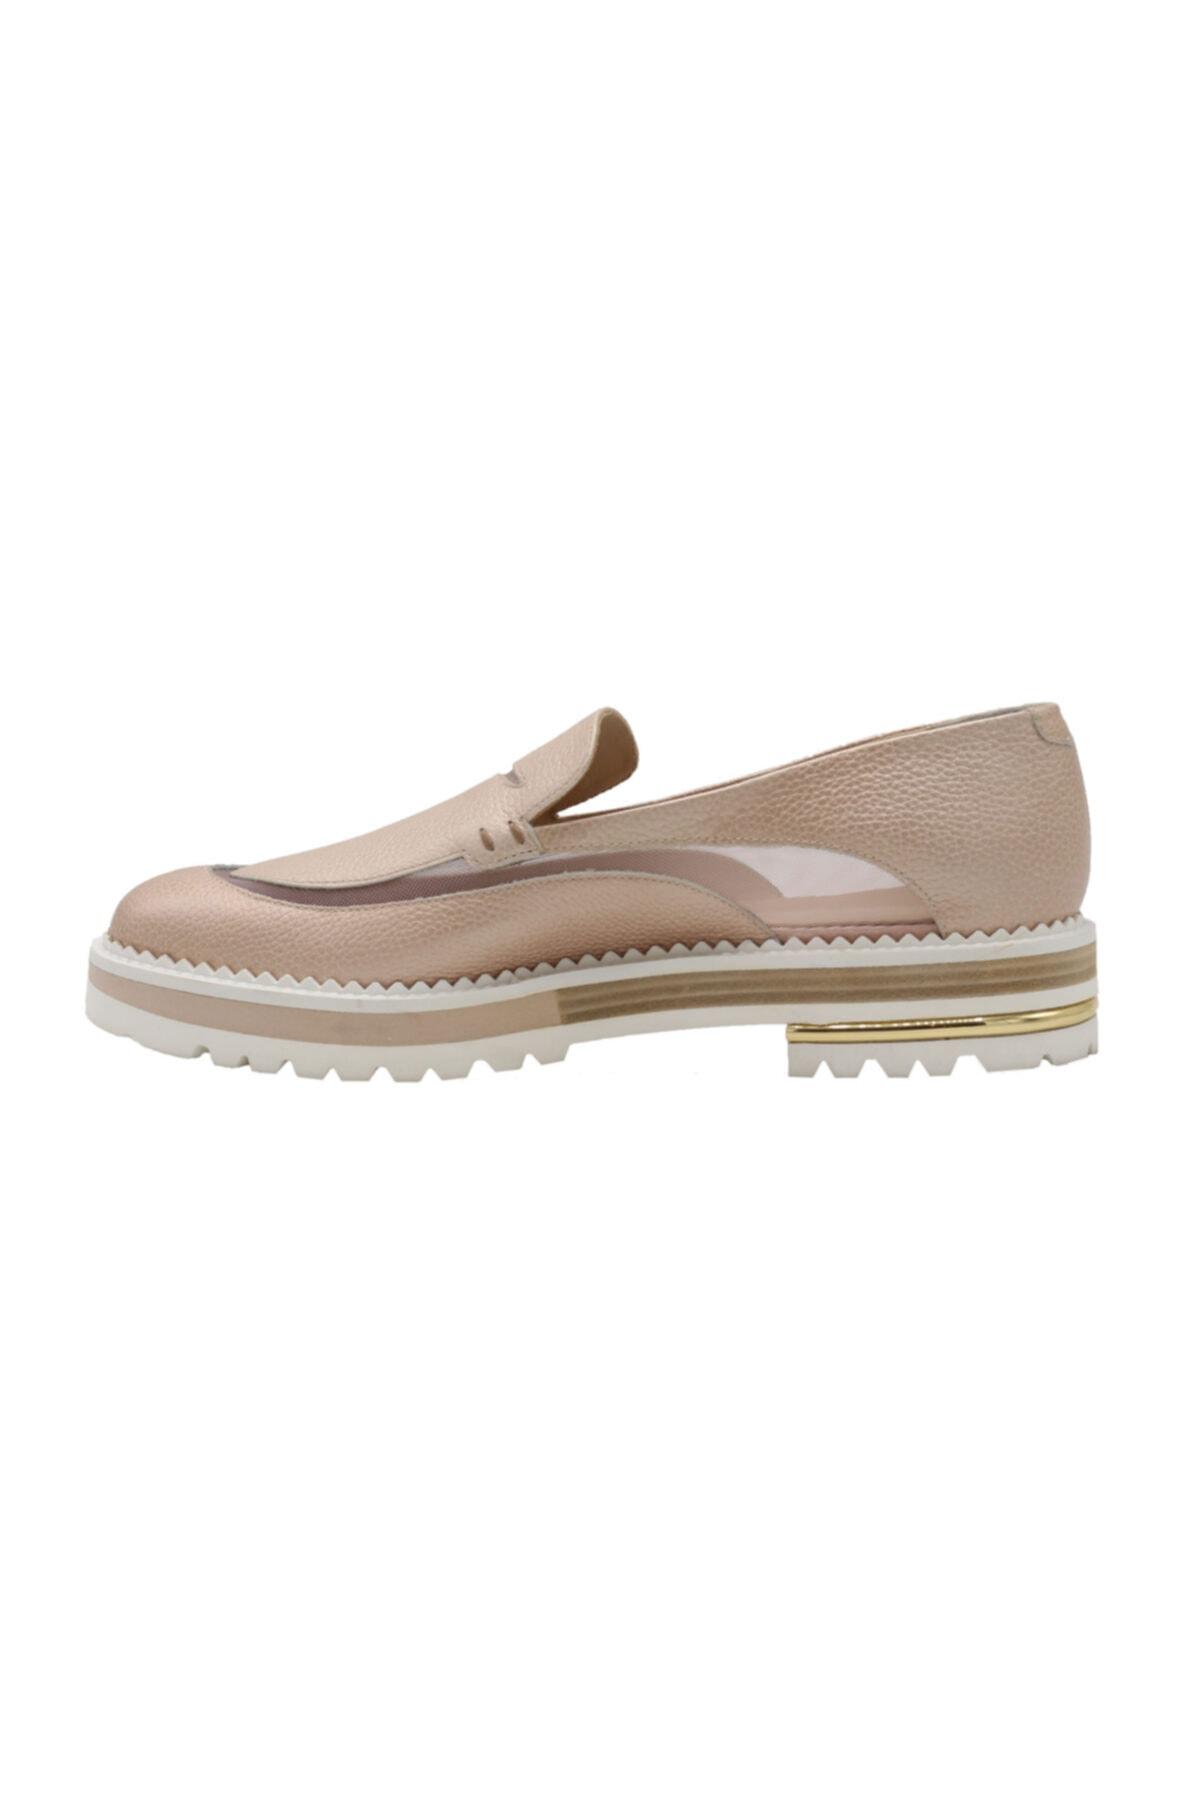 ALBERTO GUARDIANI Hakiki Deri Bayan Ayakkabı 2